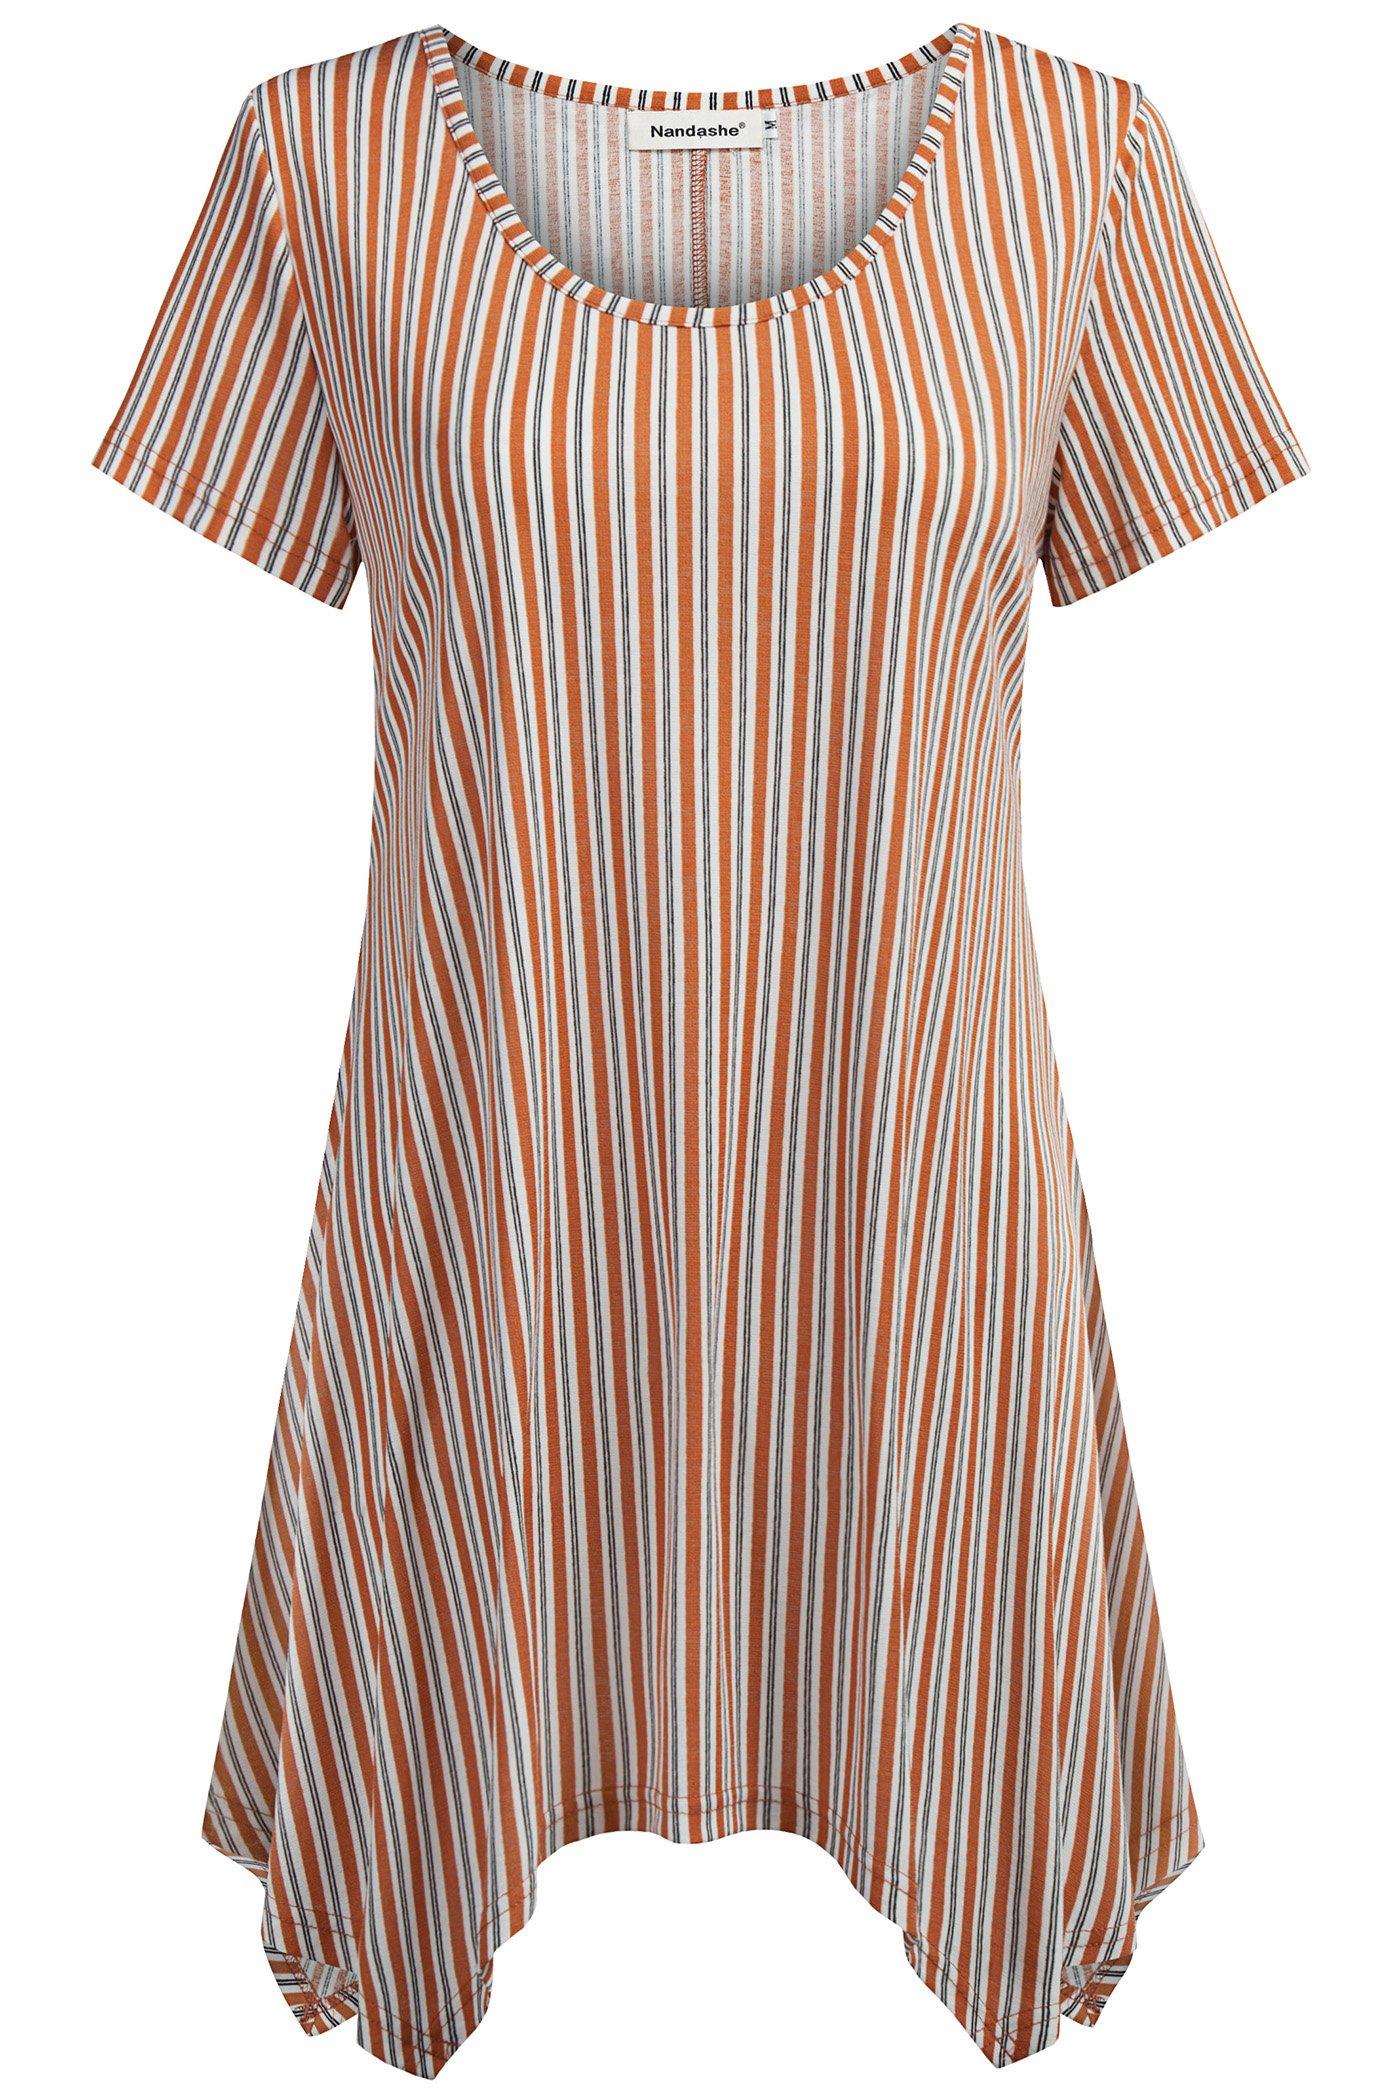 Nandashe Bohemian Shirts Women, Peplums Beautiful Striped Elastic Fabric Oversized National Rayon Slim Loose Long Tunic Blouses Summer Sweaters Orange 2XL